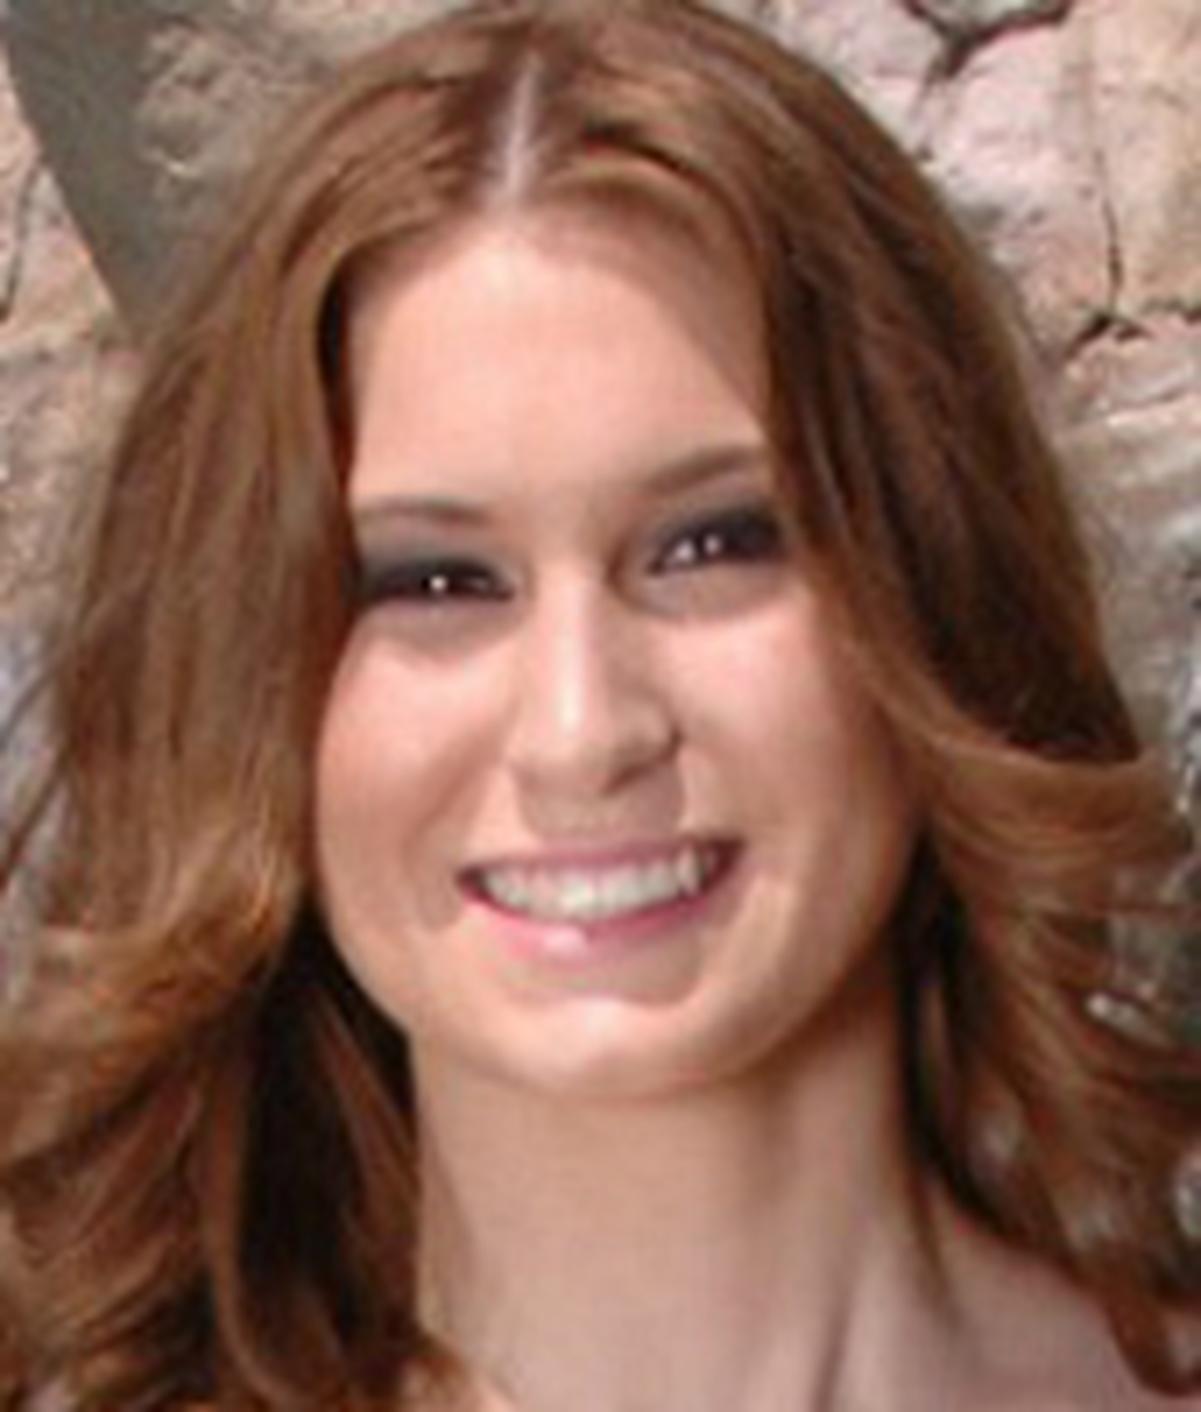 Evanna Luv